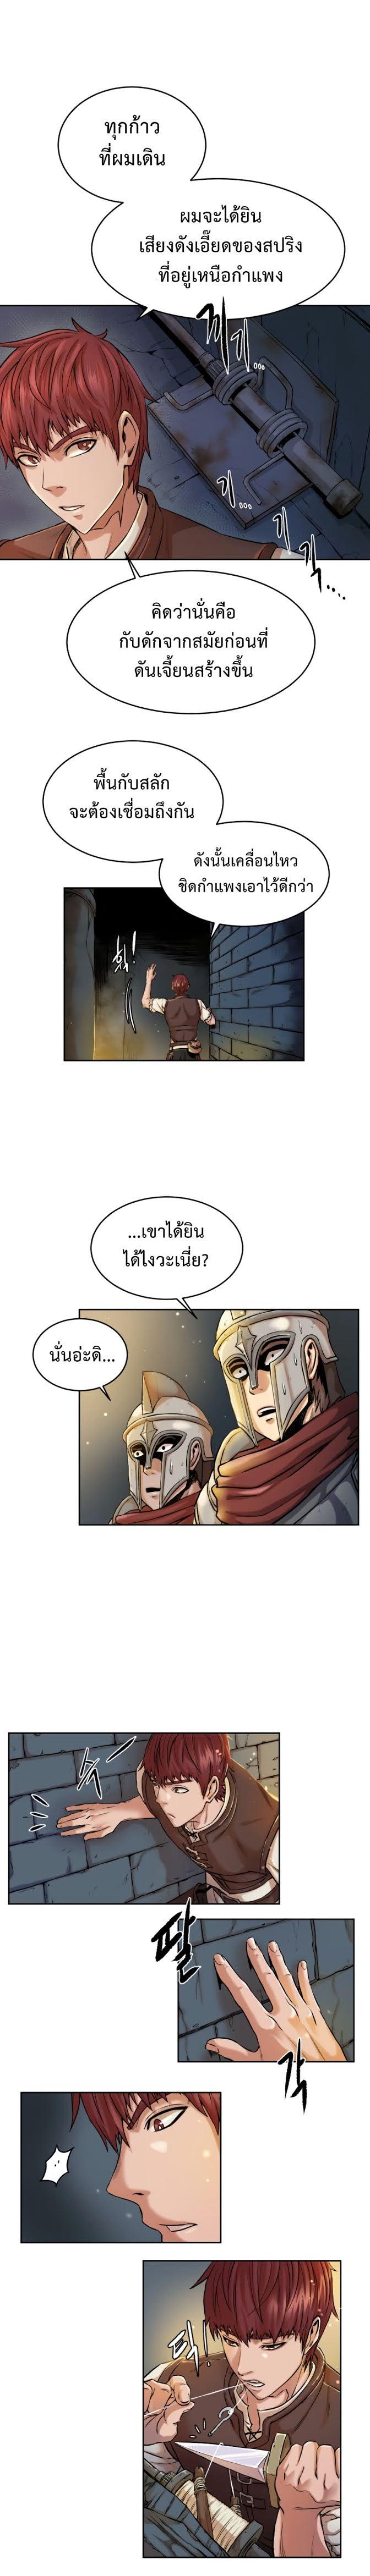 Dungeons & Artifacts - หน้า 10